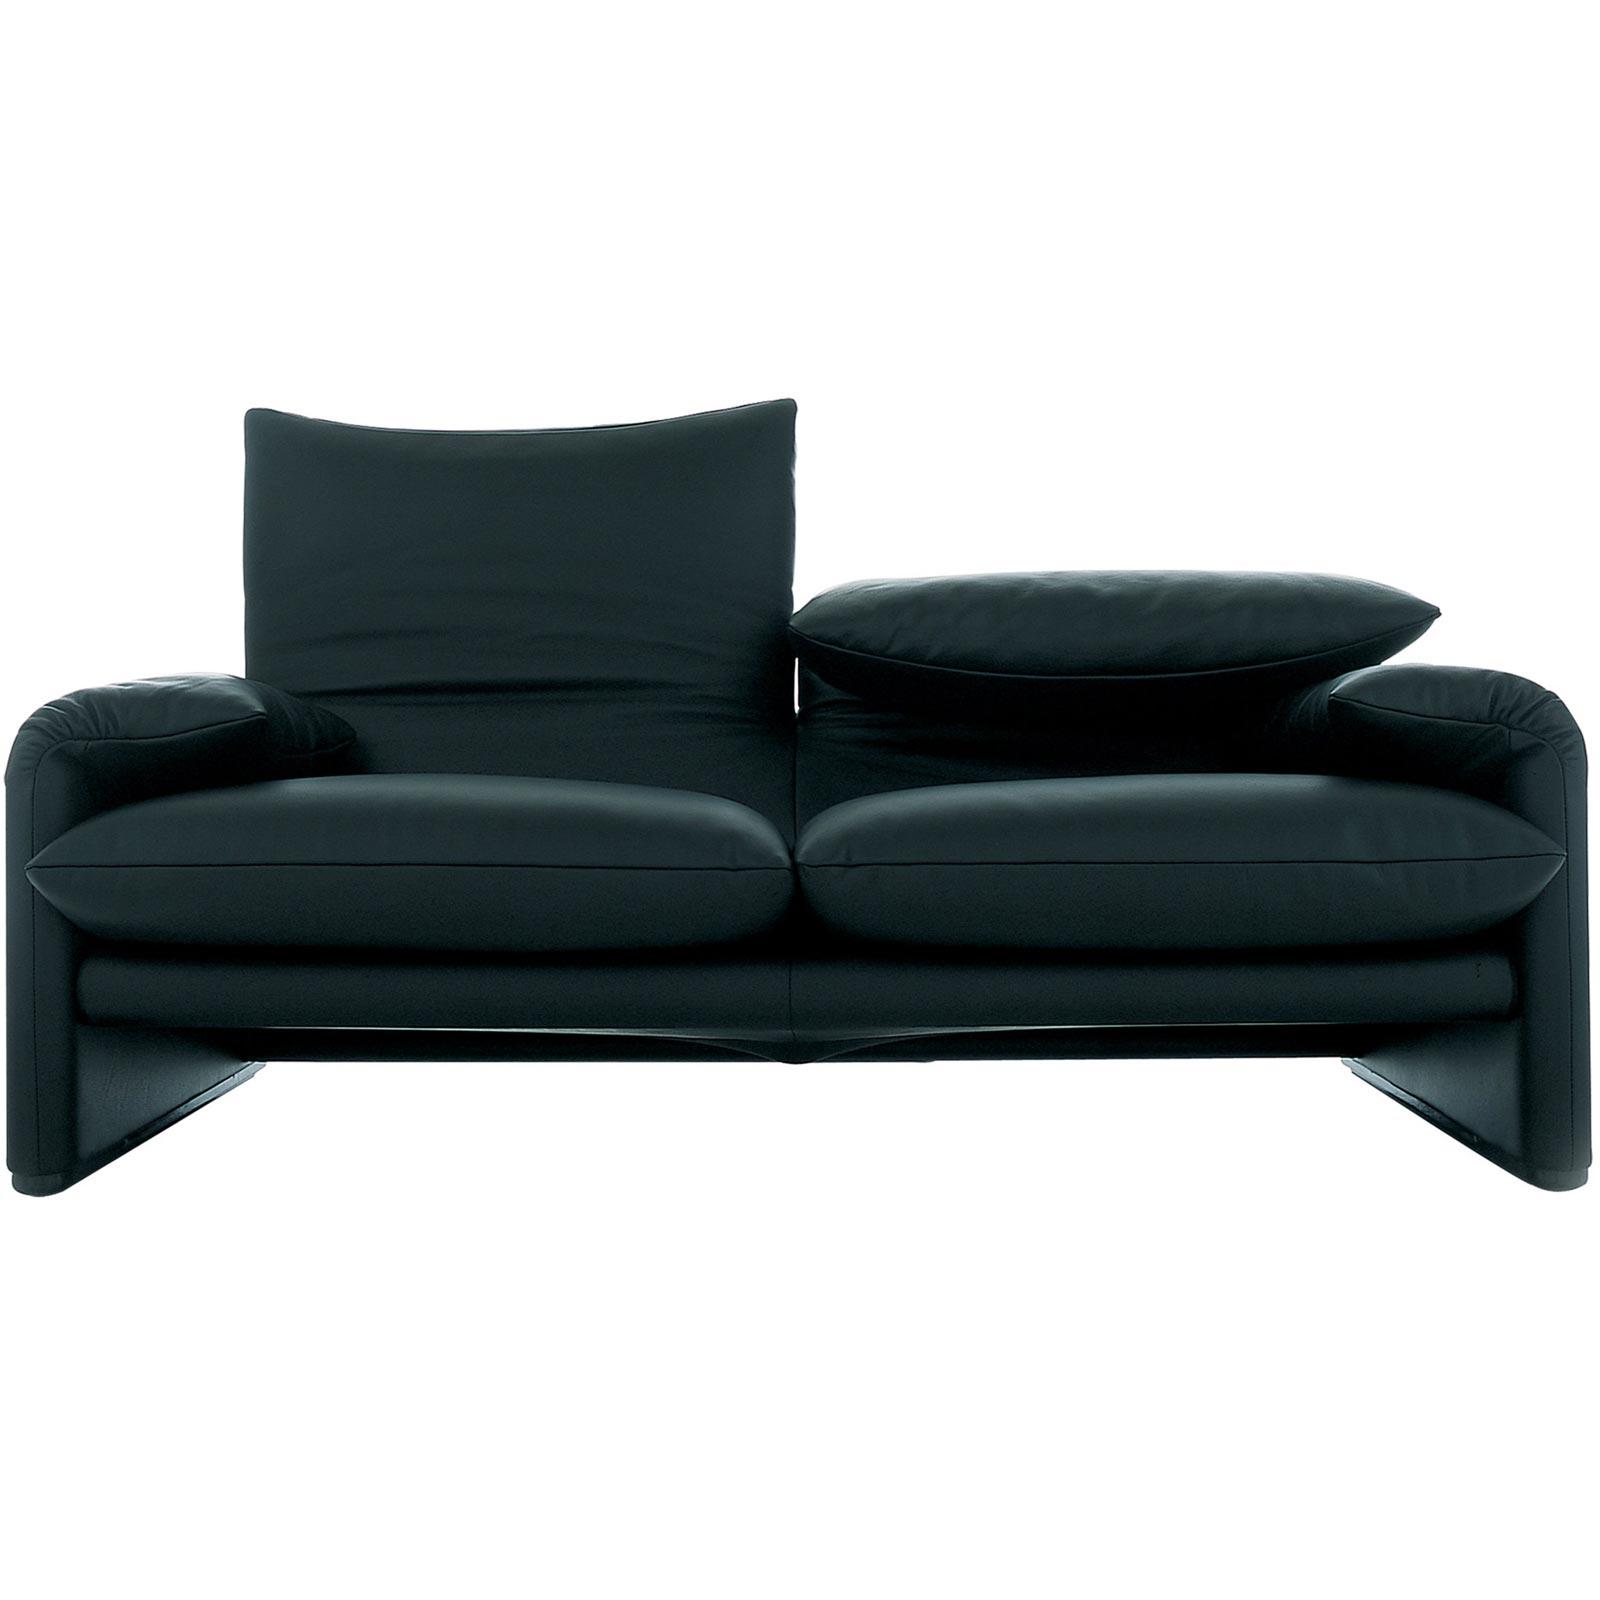 sofaprogramm maralunga von cassina. Black Bedroom Furniture Sets. Home Design Ideas